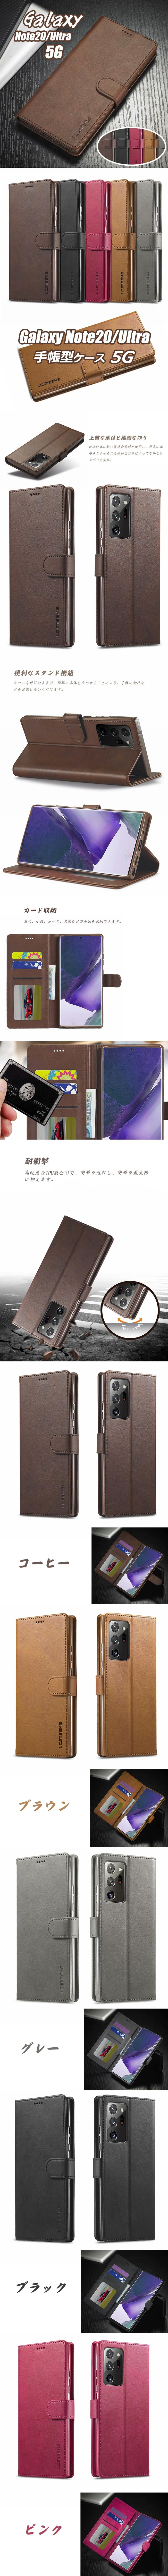 320-Samsung-皮質翻蓋側掀手機套皮套(Note20 Ultra)